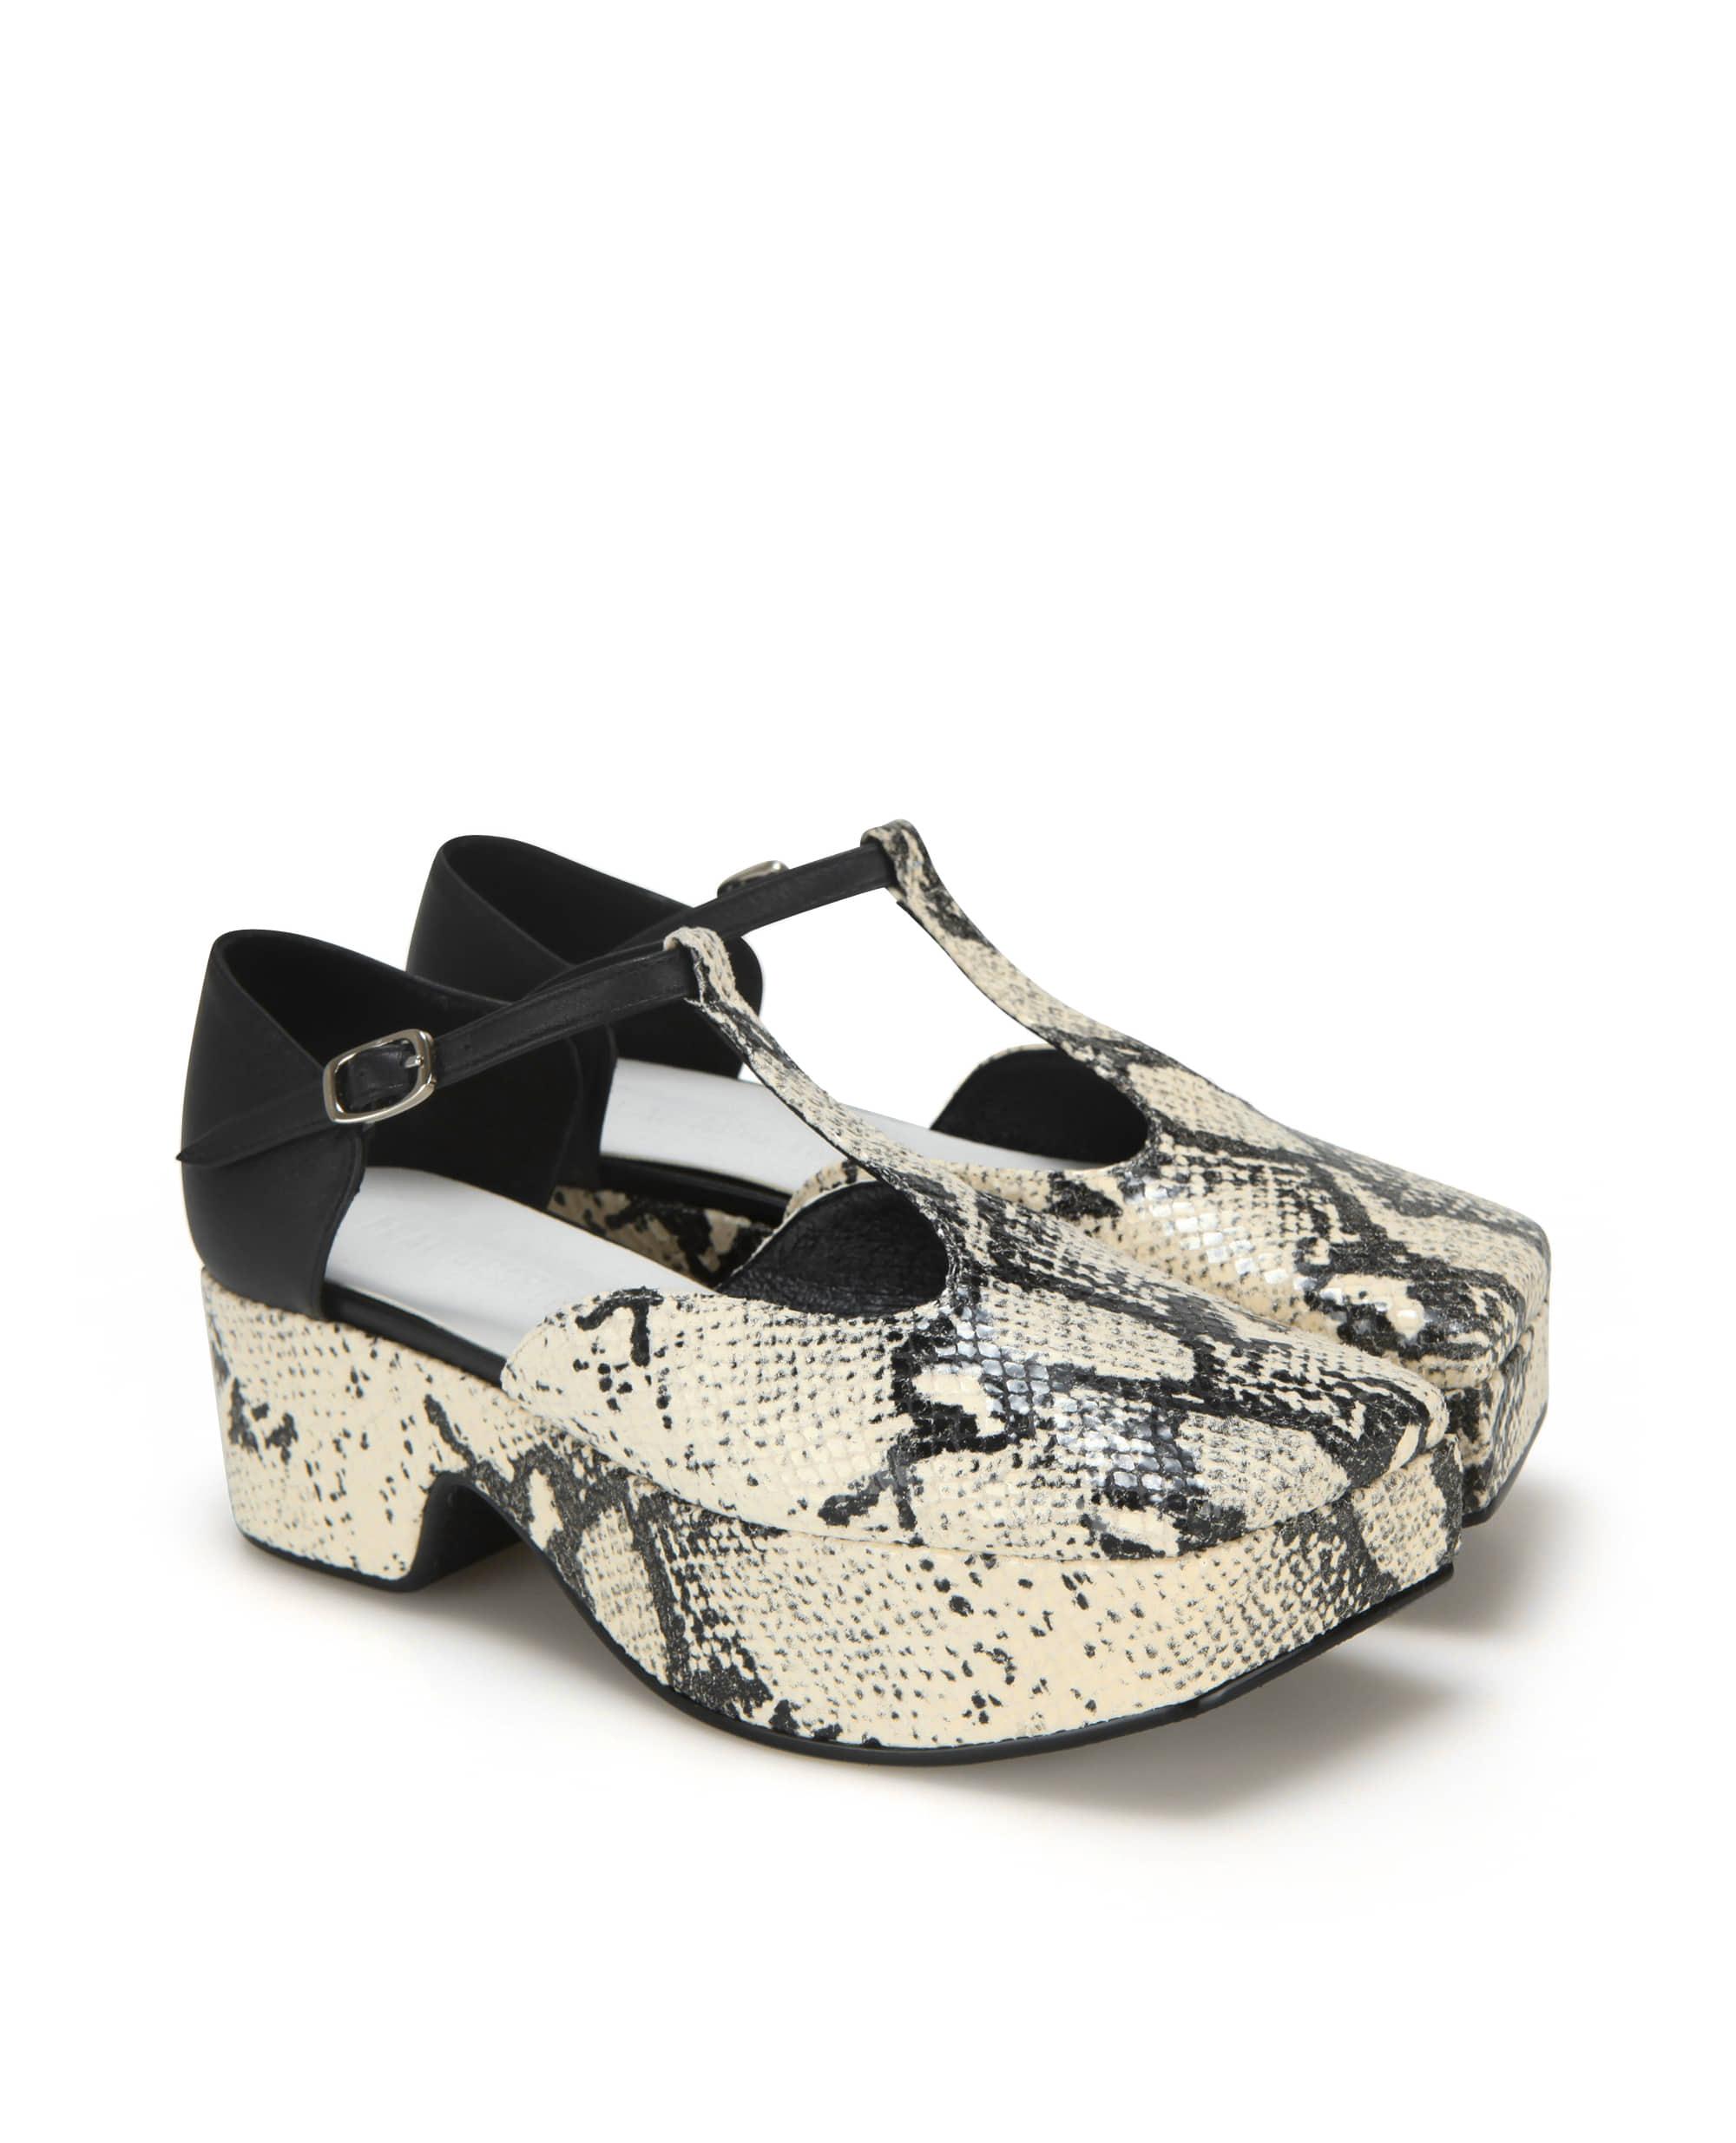 Squared toe T-strap mary jane platforms | Butter snake/Black